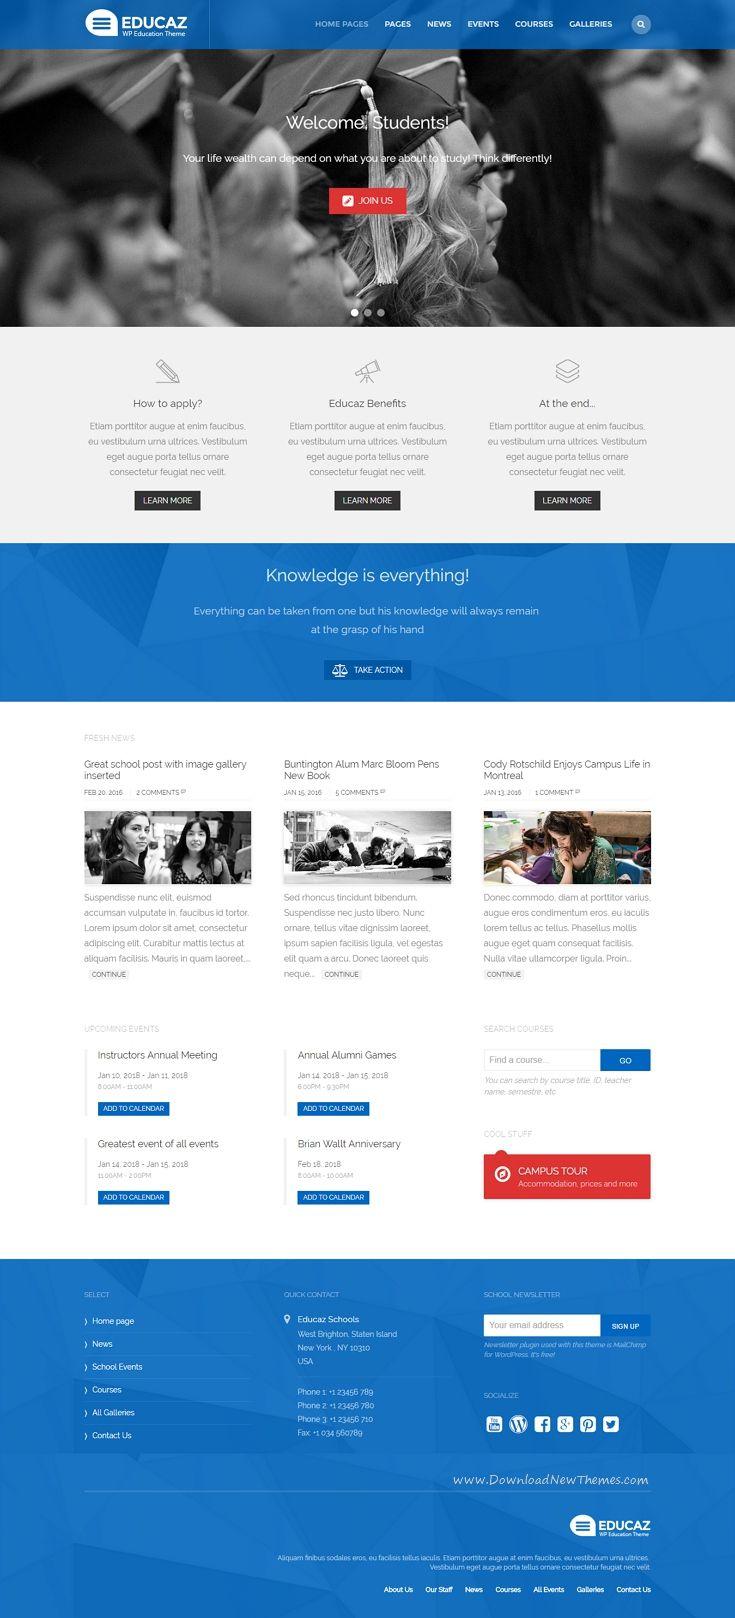 Educaz wp academic education theme wordpress web design educaz wp academic education theme pronofoot35fo Image collections